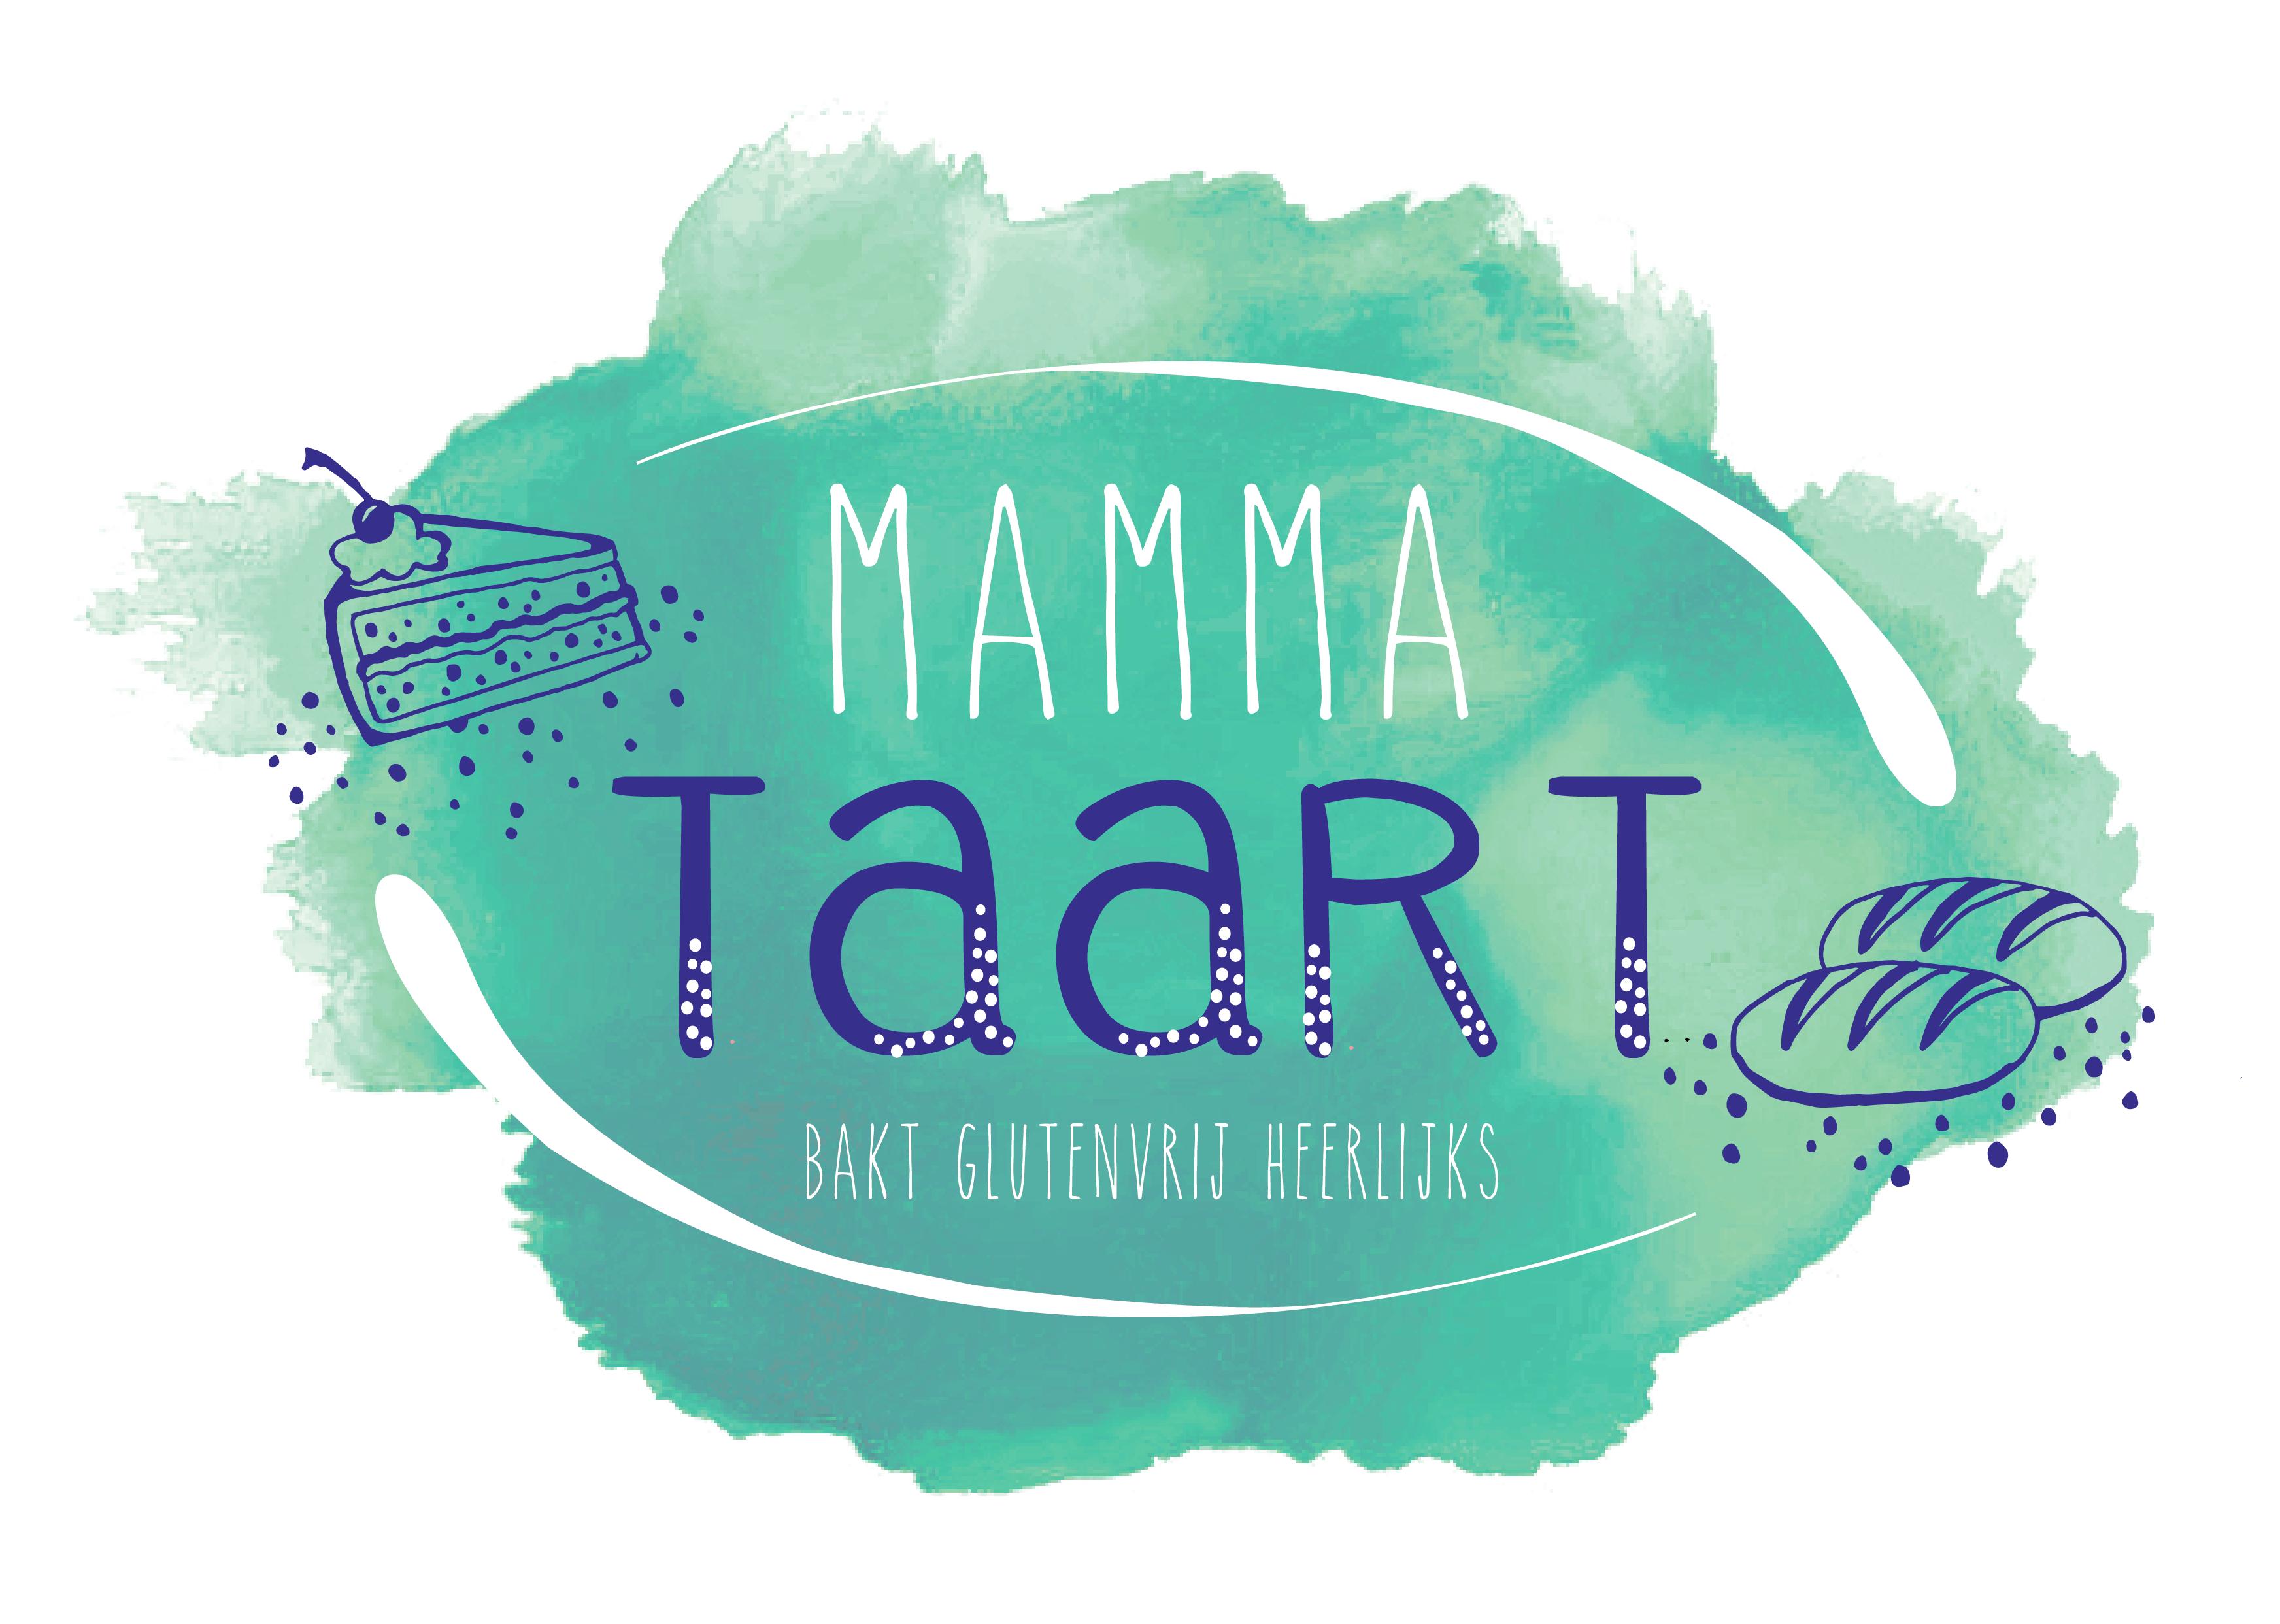 LOGO Mamma Taart - full